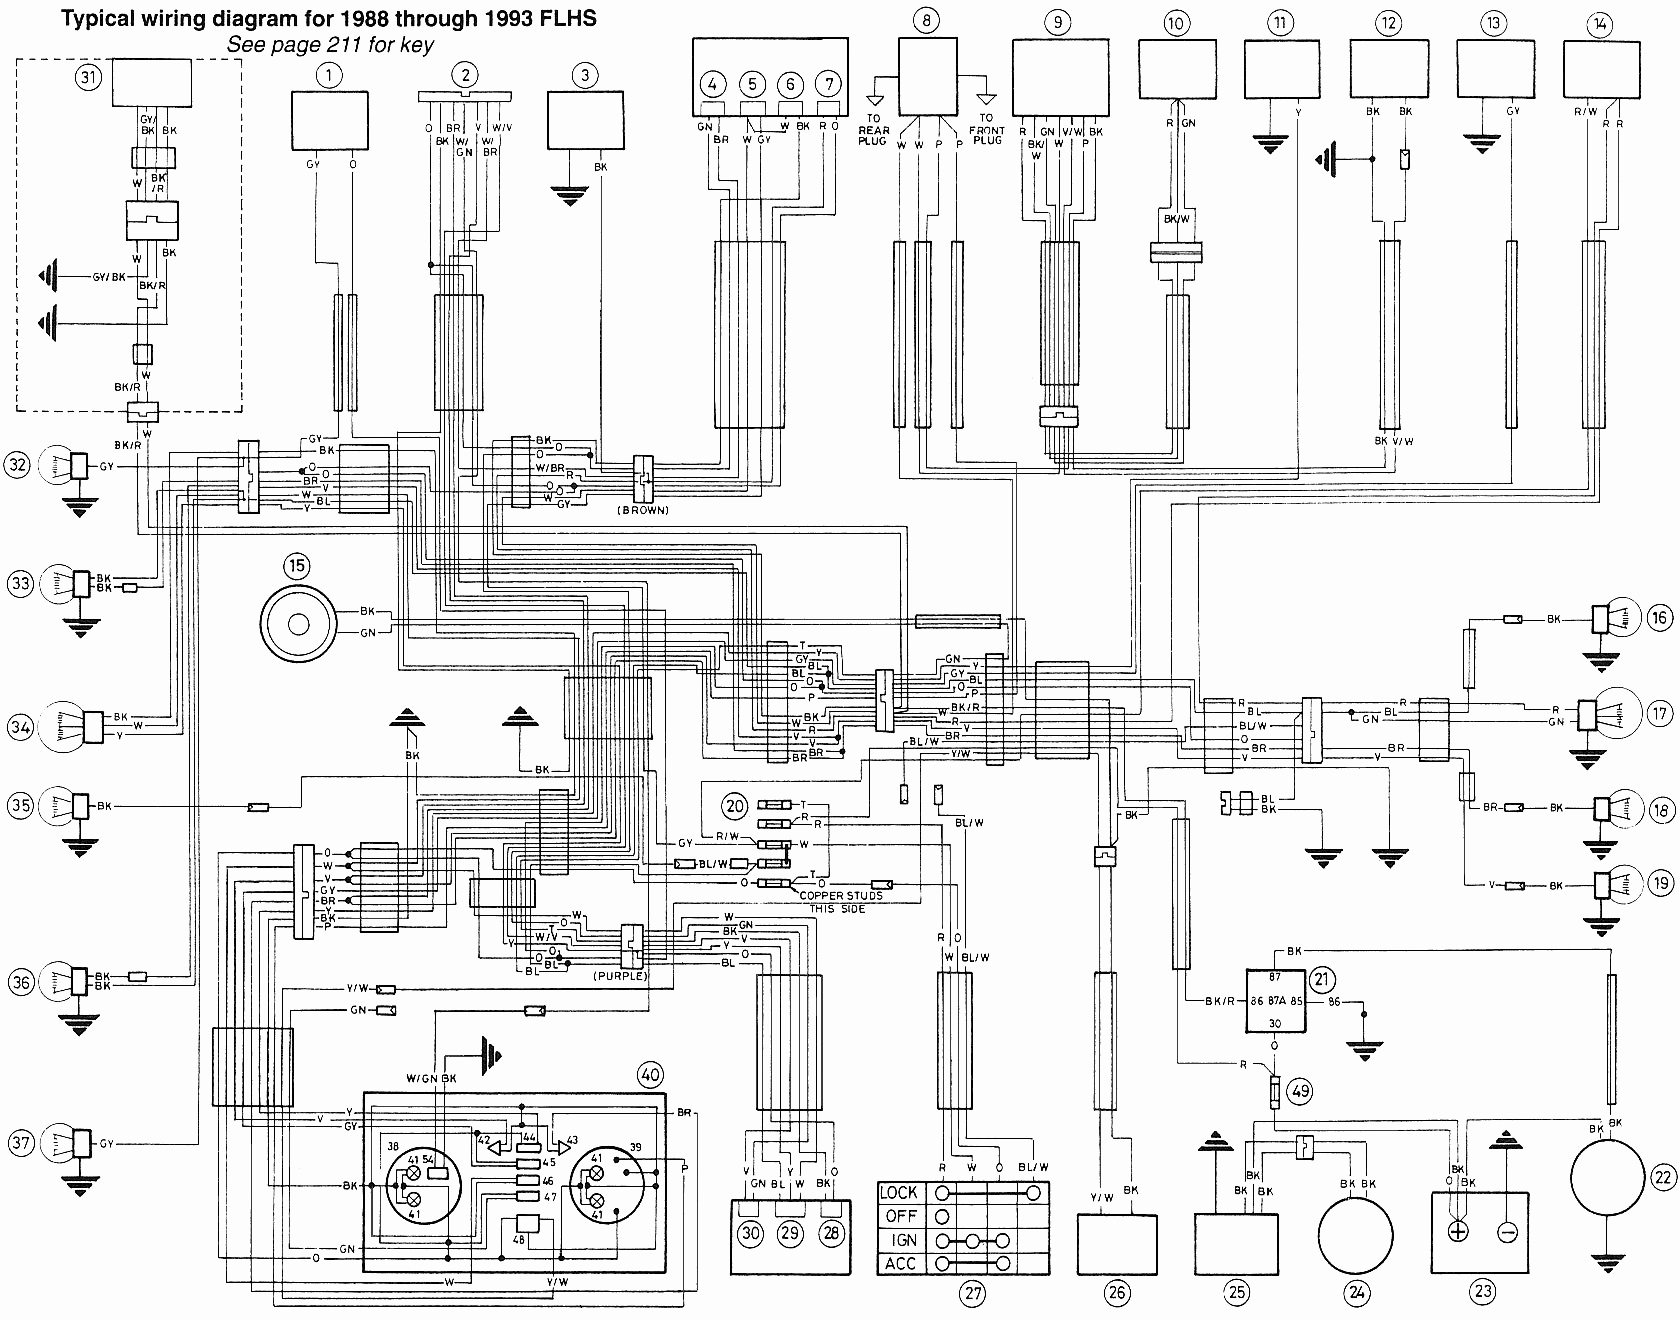 harley davidson wiring diagram download Collection-Wiring Diagram Harley Davidson Wiring Diagram Download Unique 1-k